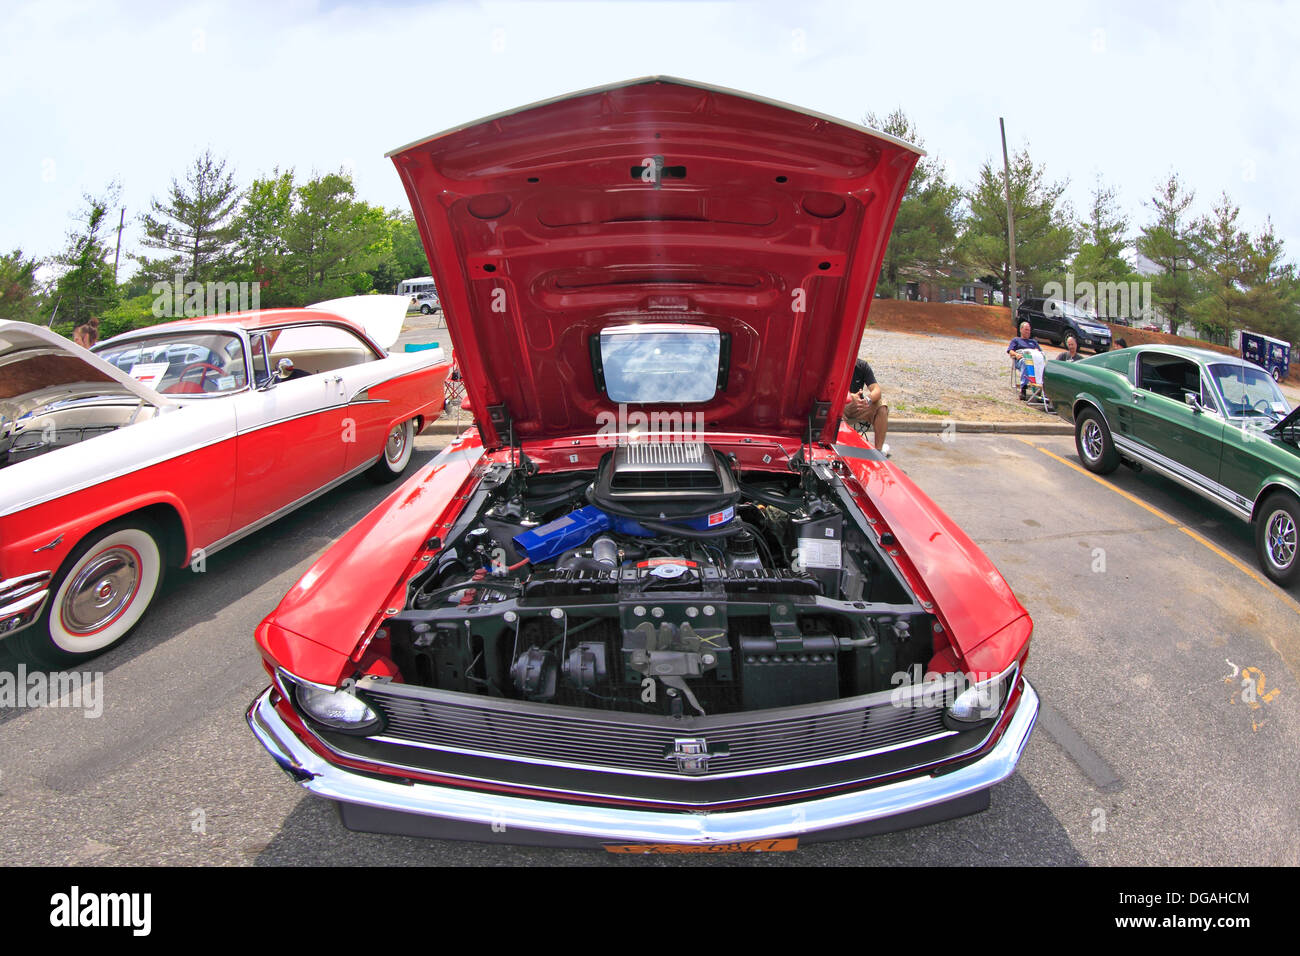 Long Island Car Shows >> Classic Ford Car Show Long Island New York Stock Photo 61698804 Alamy